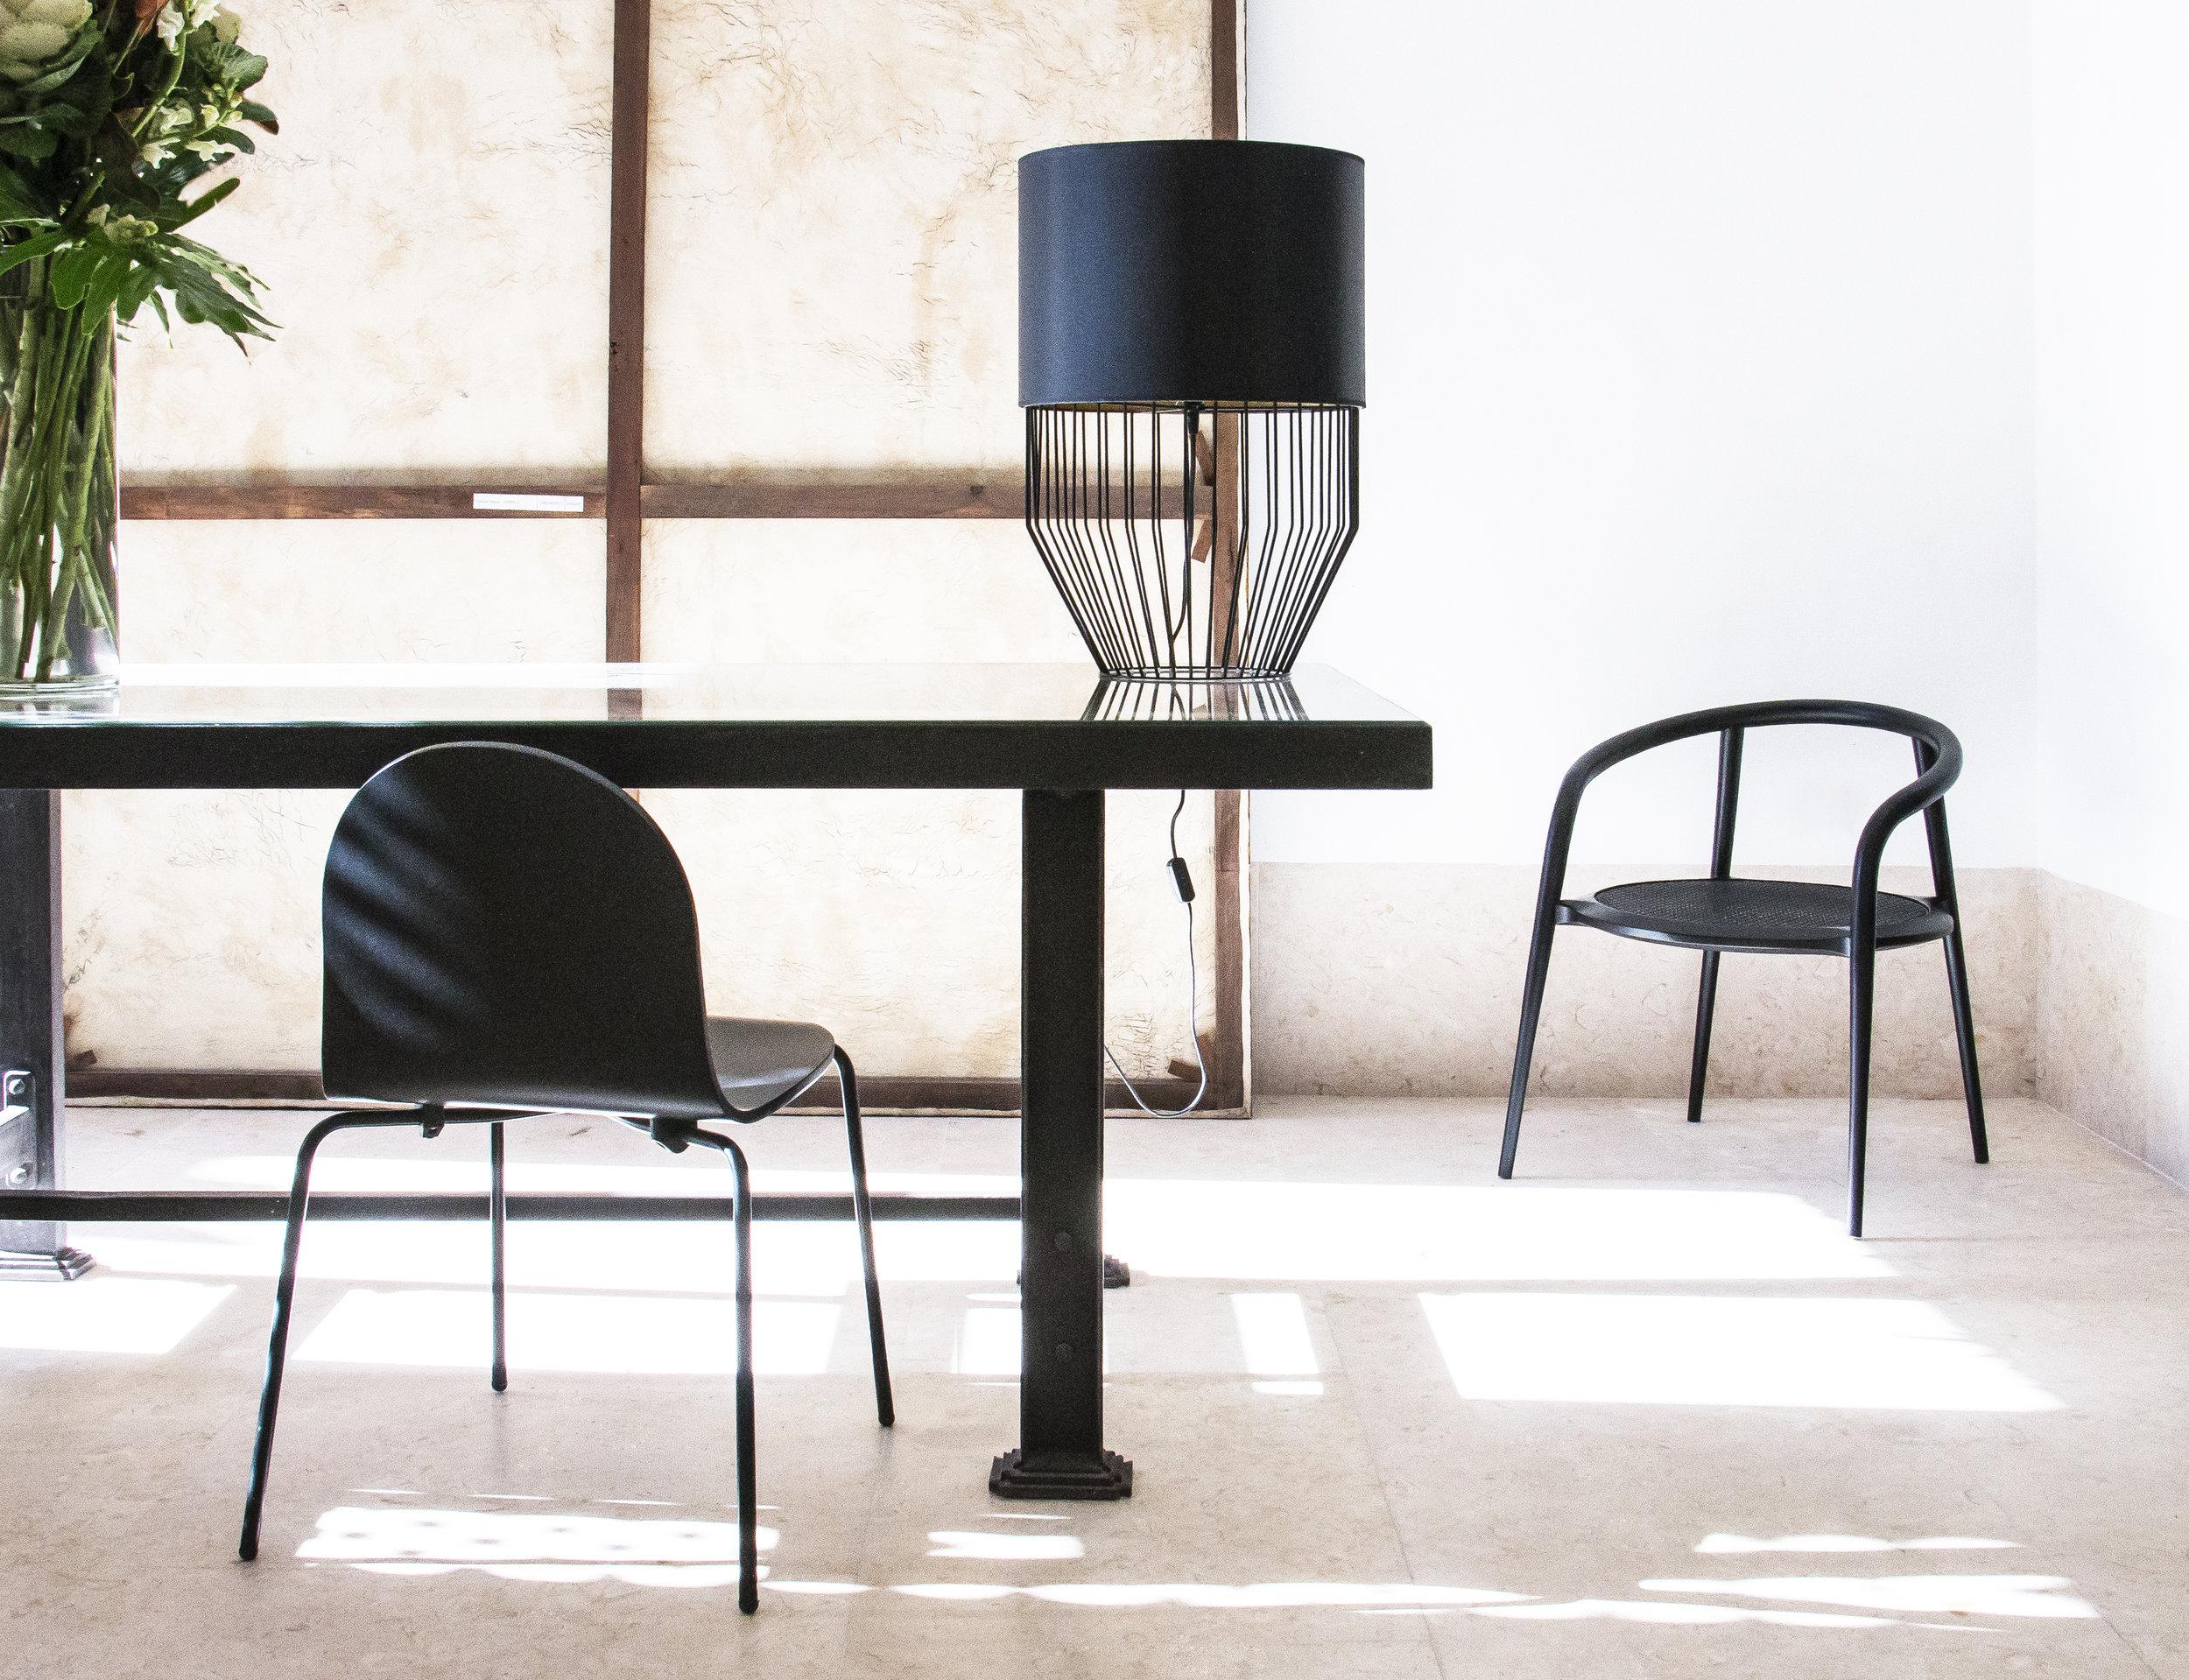 Aranha + Norma + Raio table.jpg